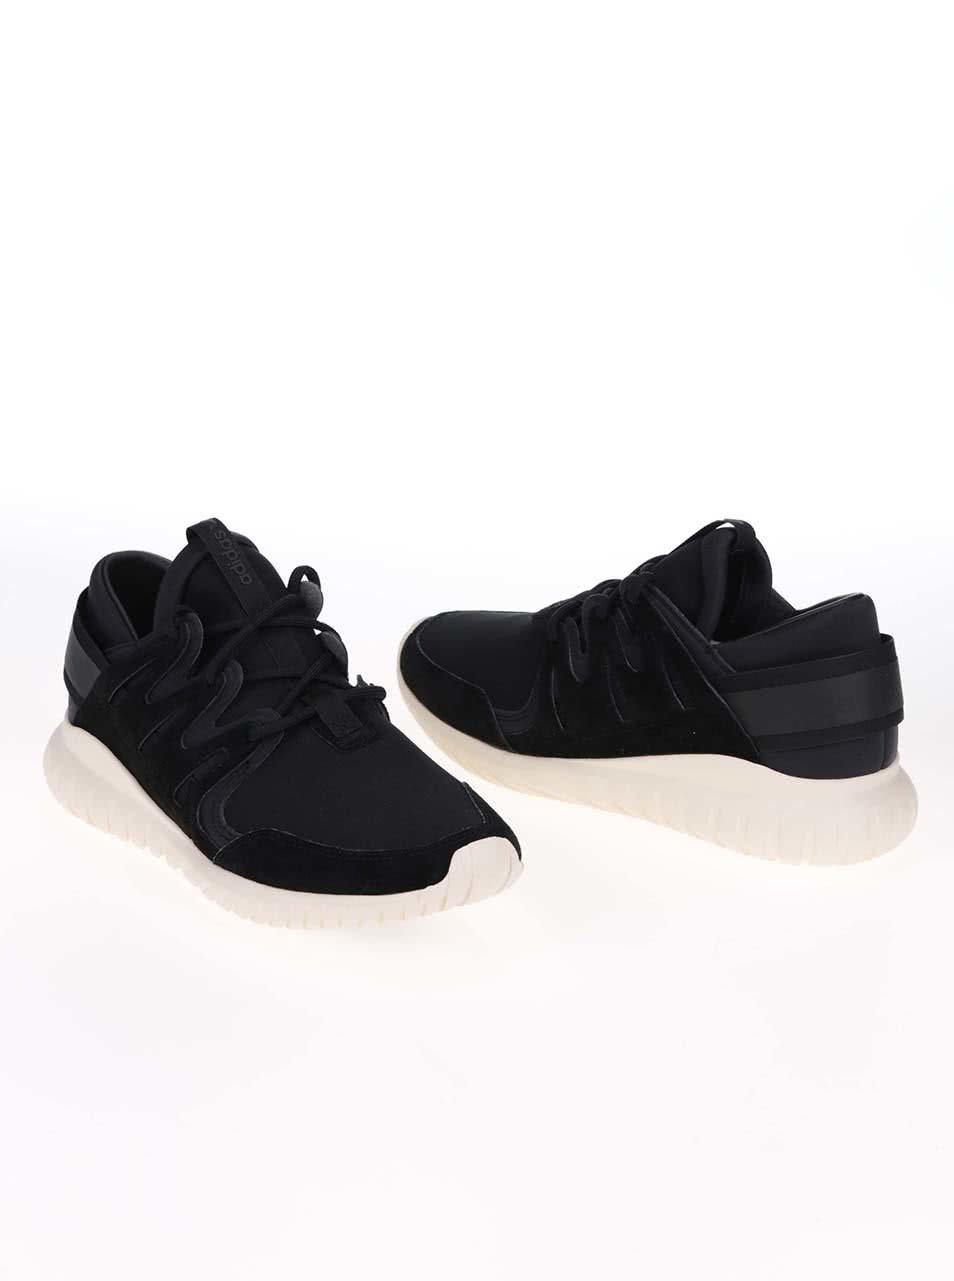 Krémovo-čierne pánske tenisky adidas Originals Tubular Nova ... b3784f08161